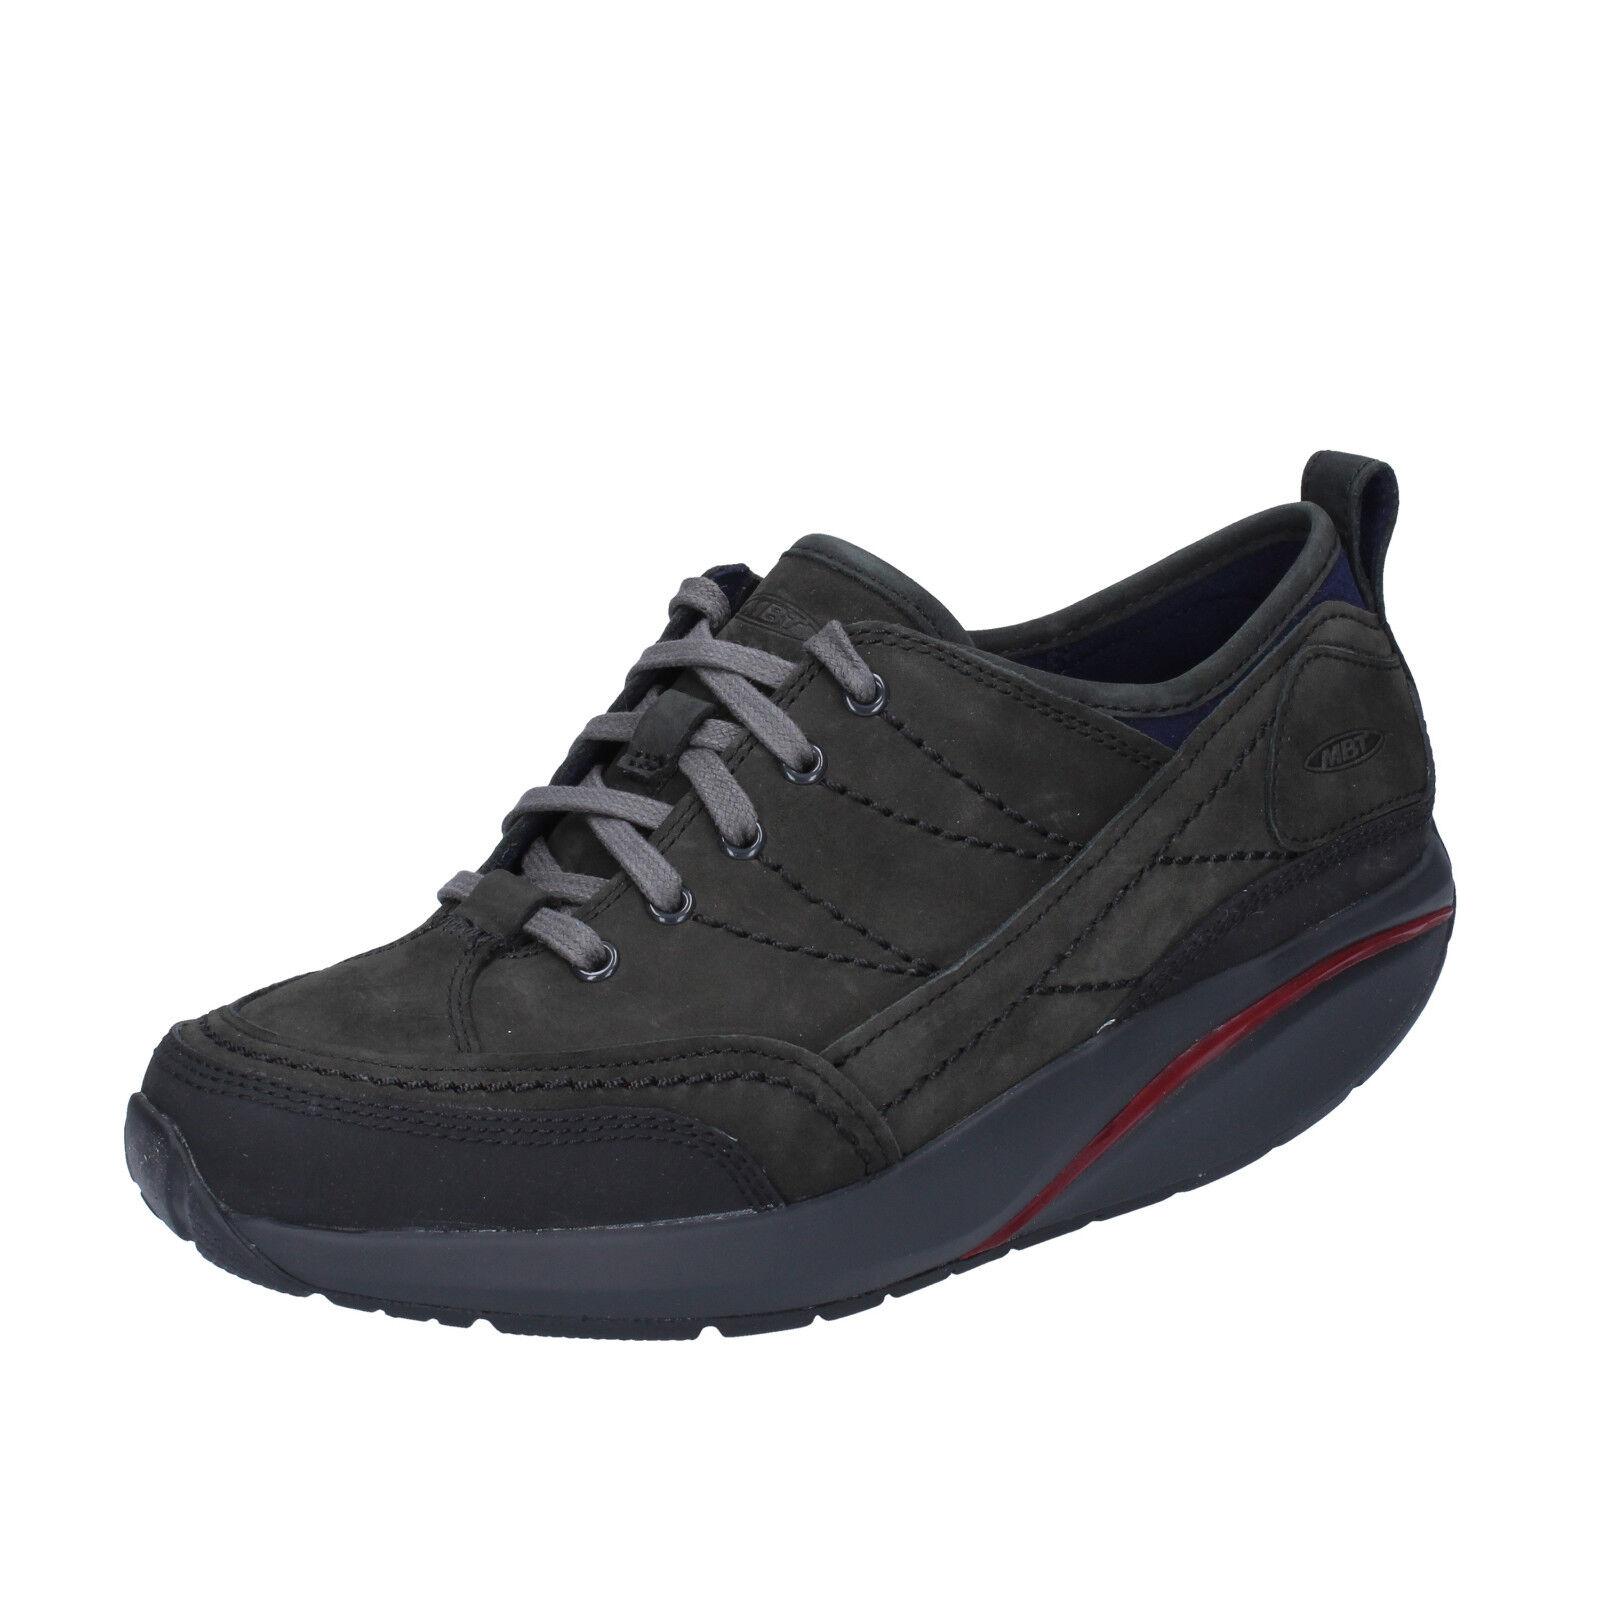 femmes   chaussures  MBT 5 / 5,5 (EU 36) sneakers  noir  leather performance BT96-36